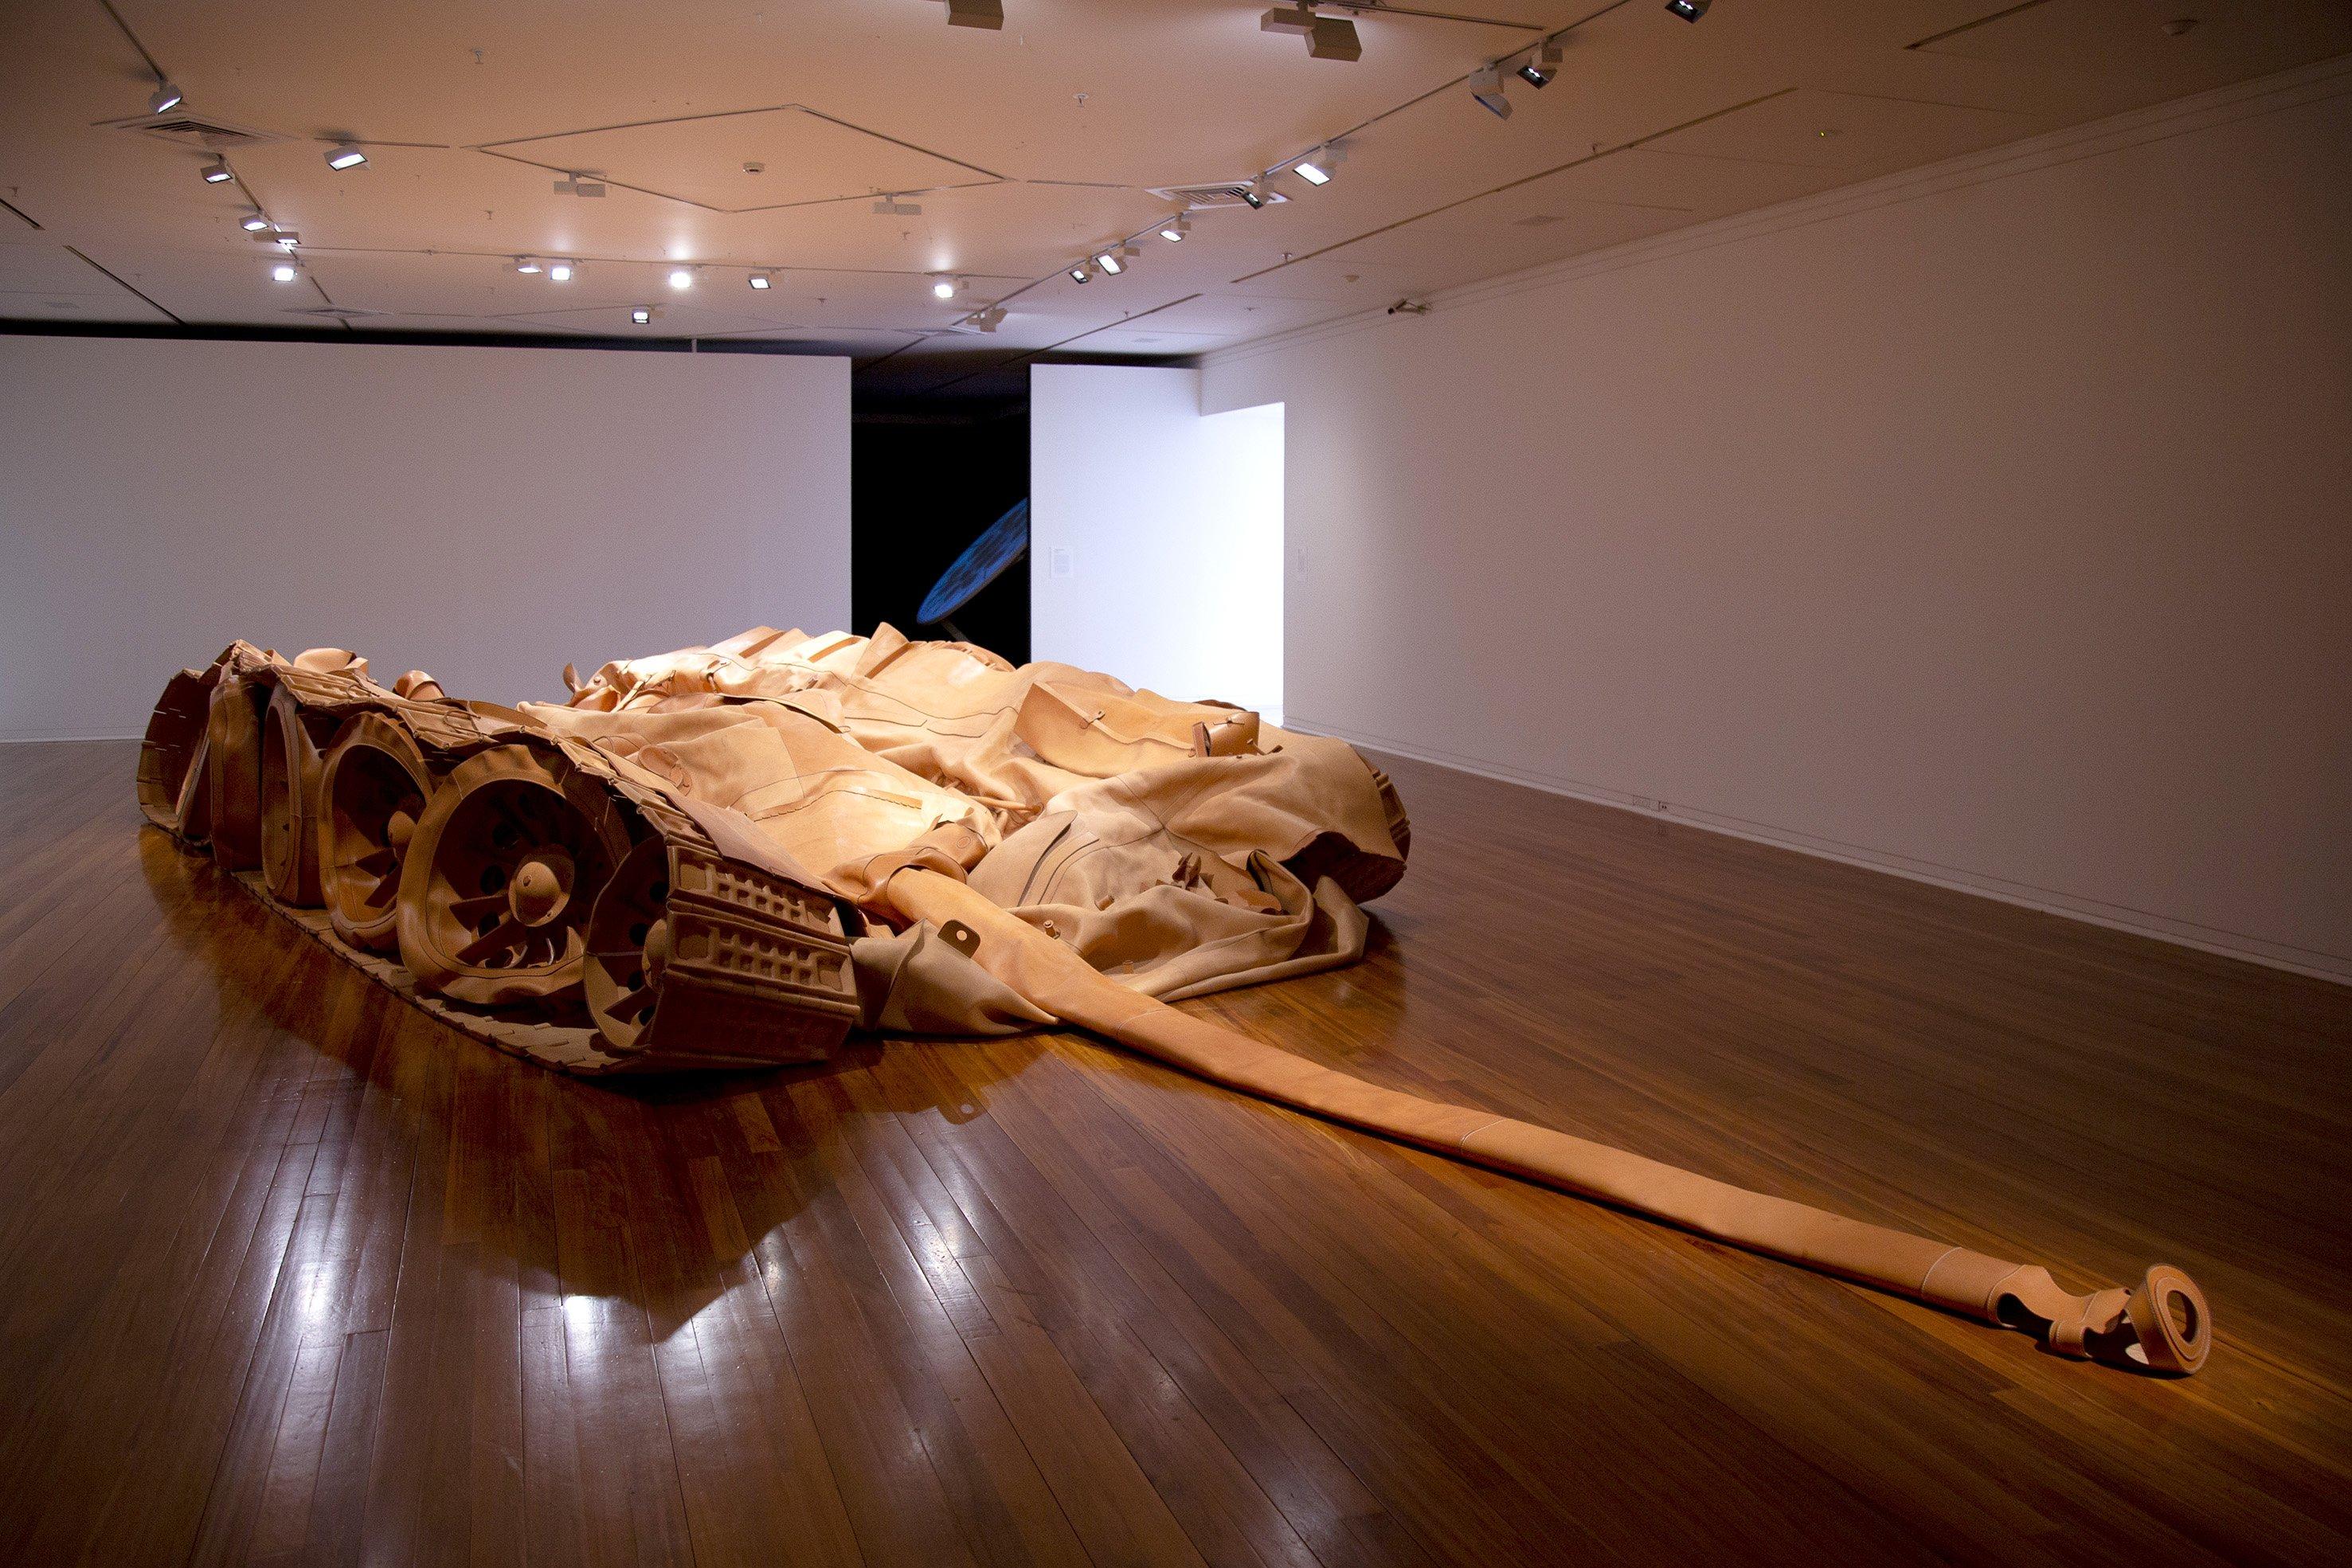 Tank Project, 2011-2013, by Xe Xiangyu